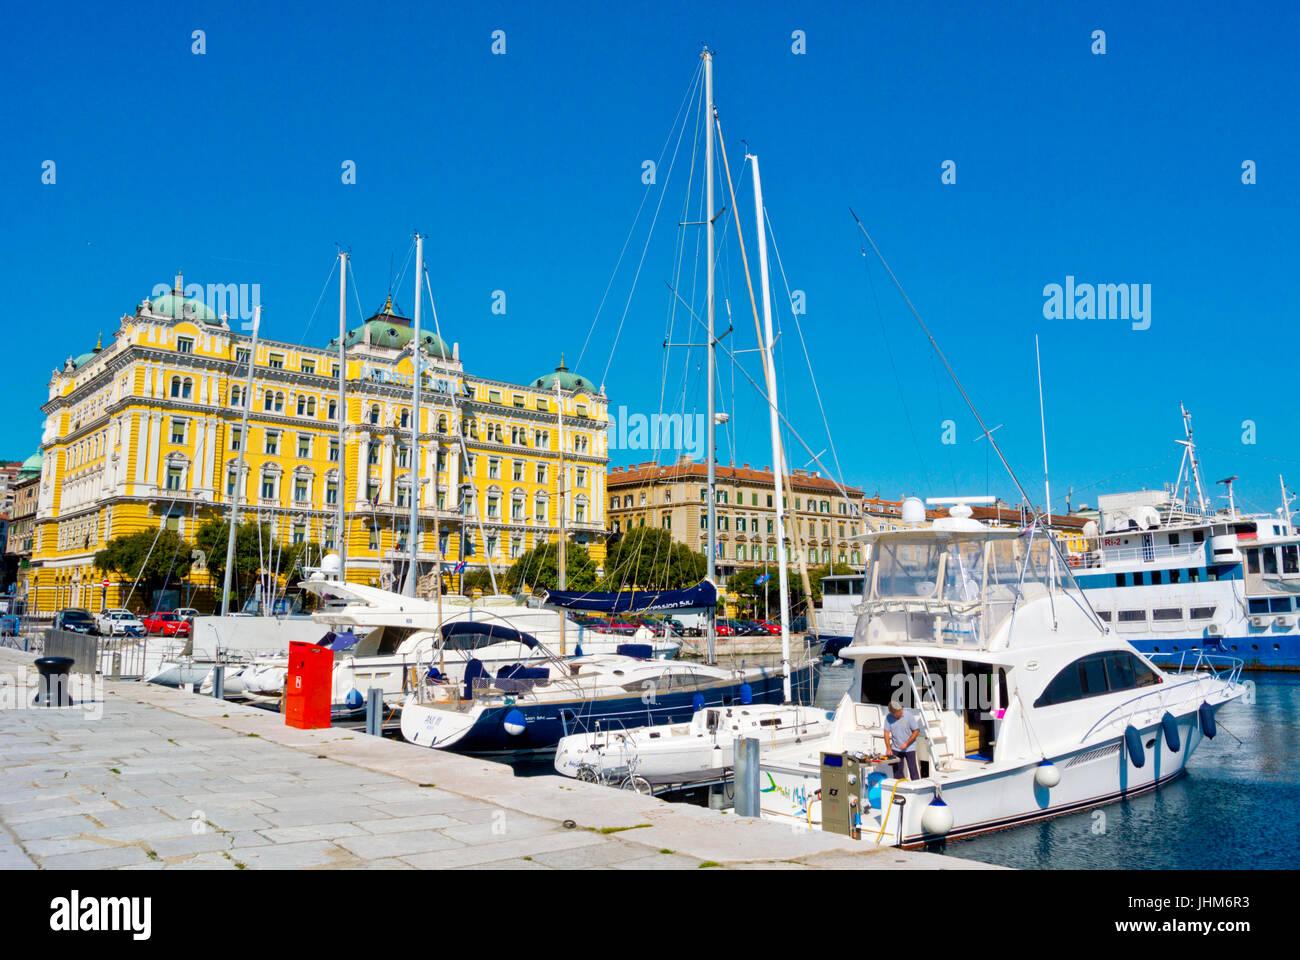 Private boats, harbour, at Riva seaside street, Rijeka, Kvarner Bay, Croatia - Stock Image